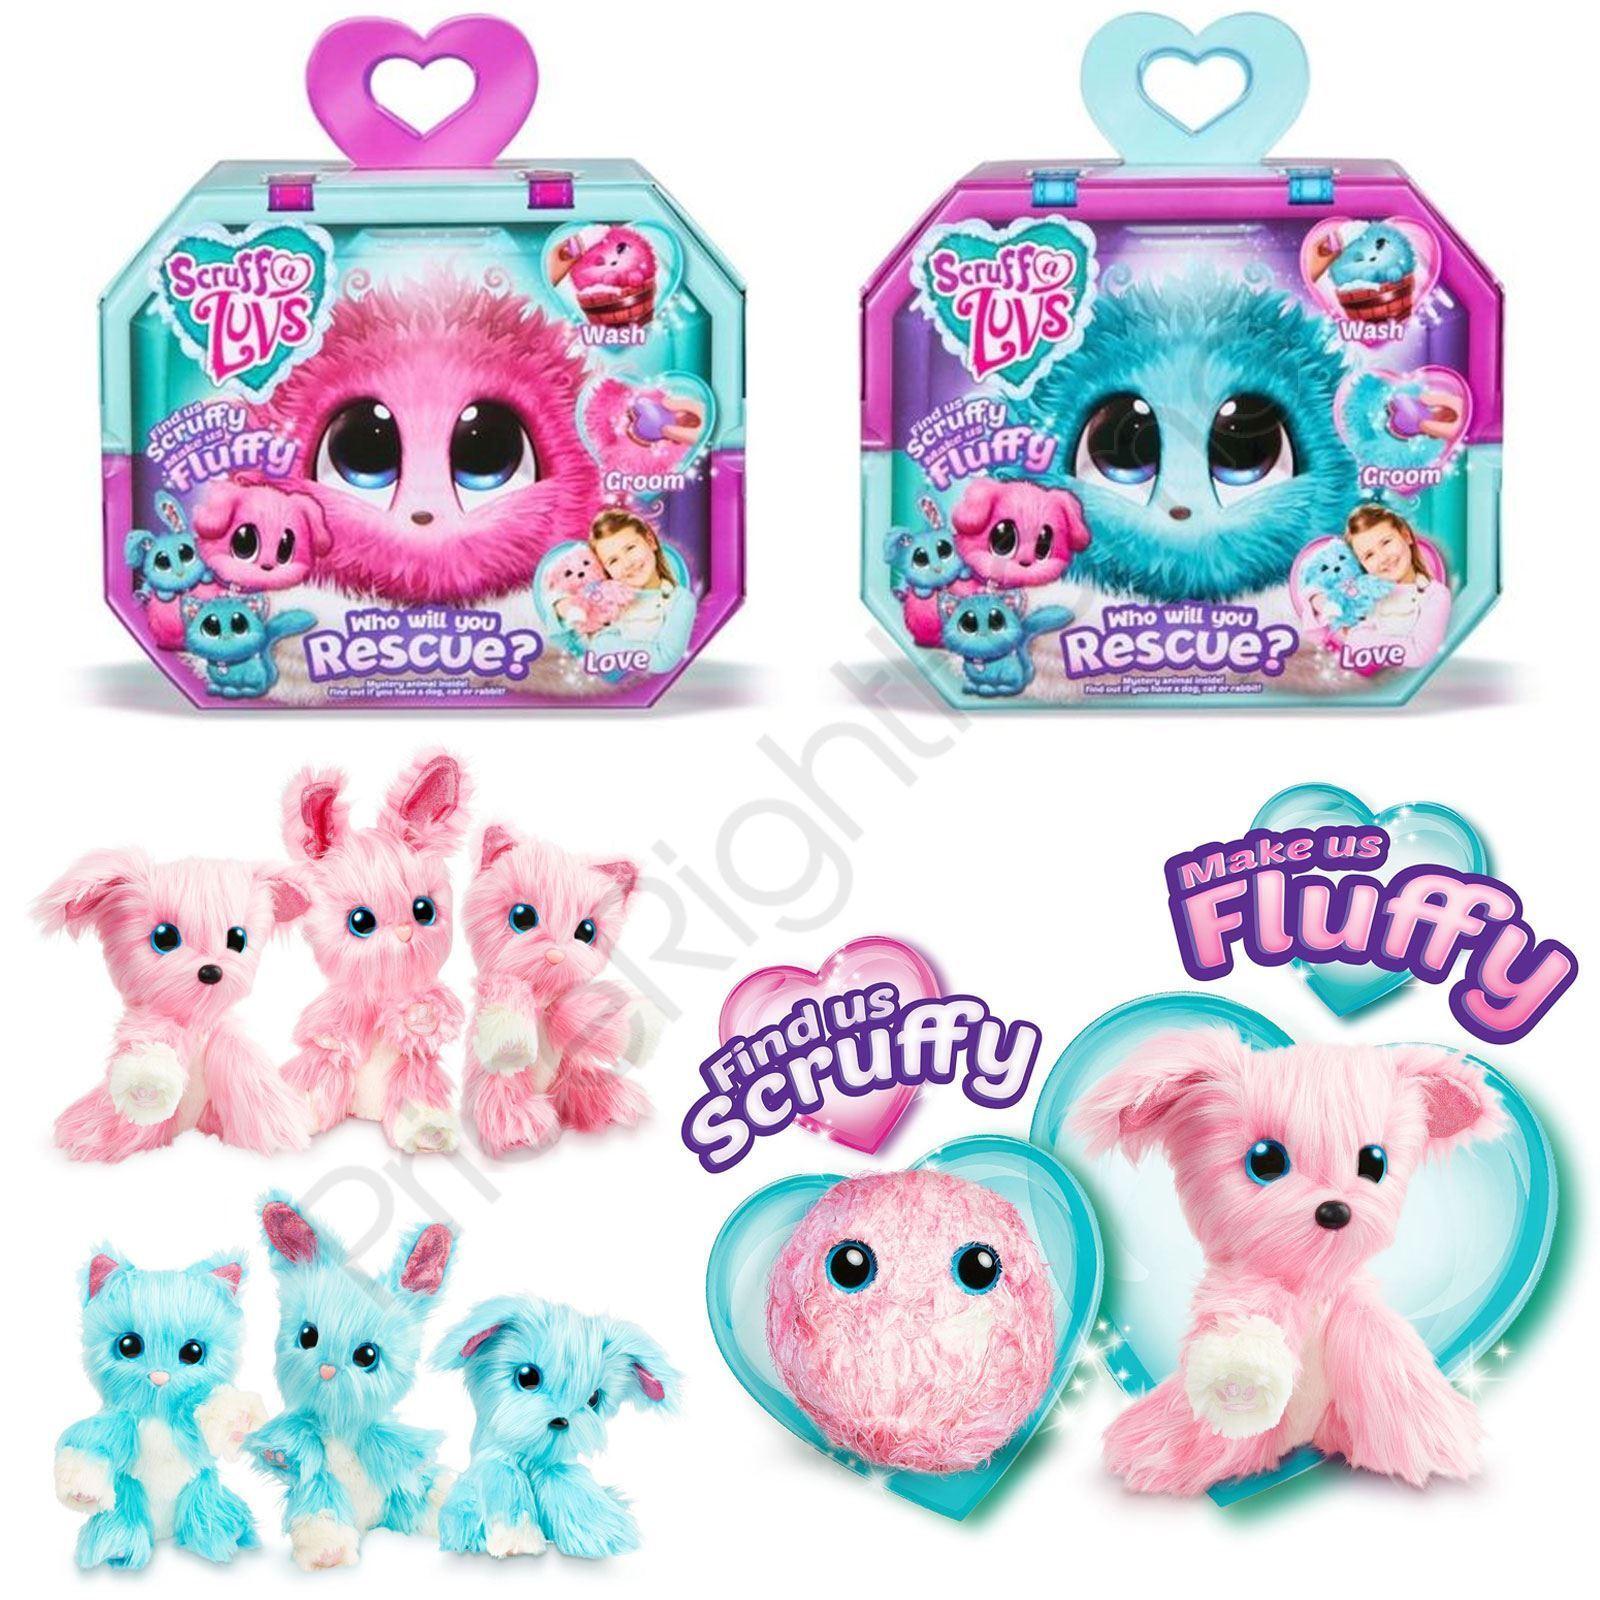 SCRUFF-A-LUVS MYSTERY RESCUE FLUFFY FURRY ANIMAL PET KIDS TOY - PINK & AQUA blueE